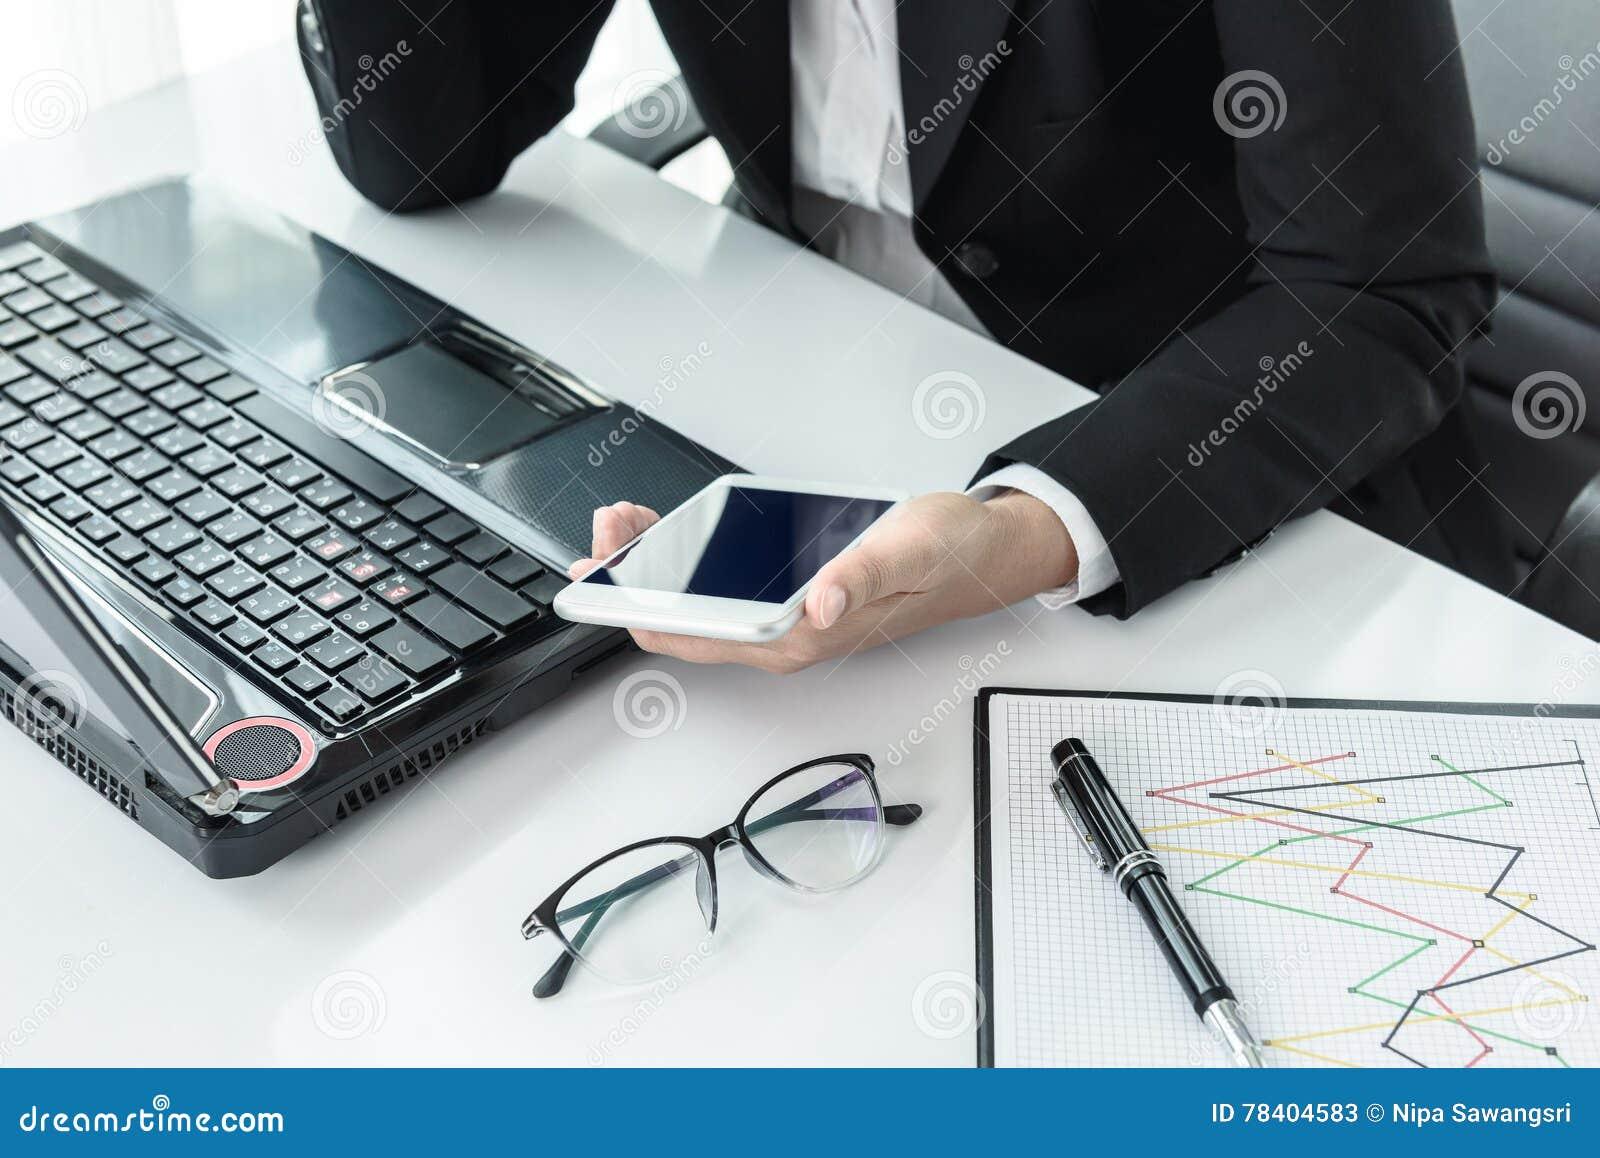 Onderneemster die met moderne apparaten werken labtop computer en m stock afbeelding - Moderne apparaten ...